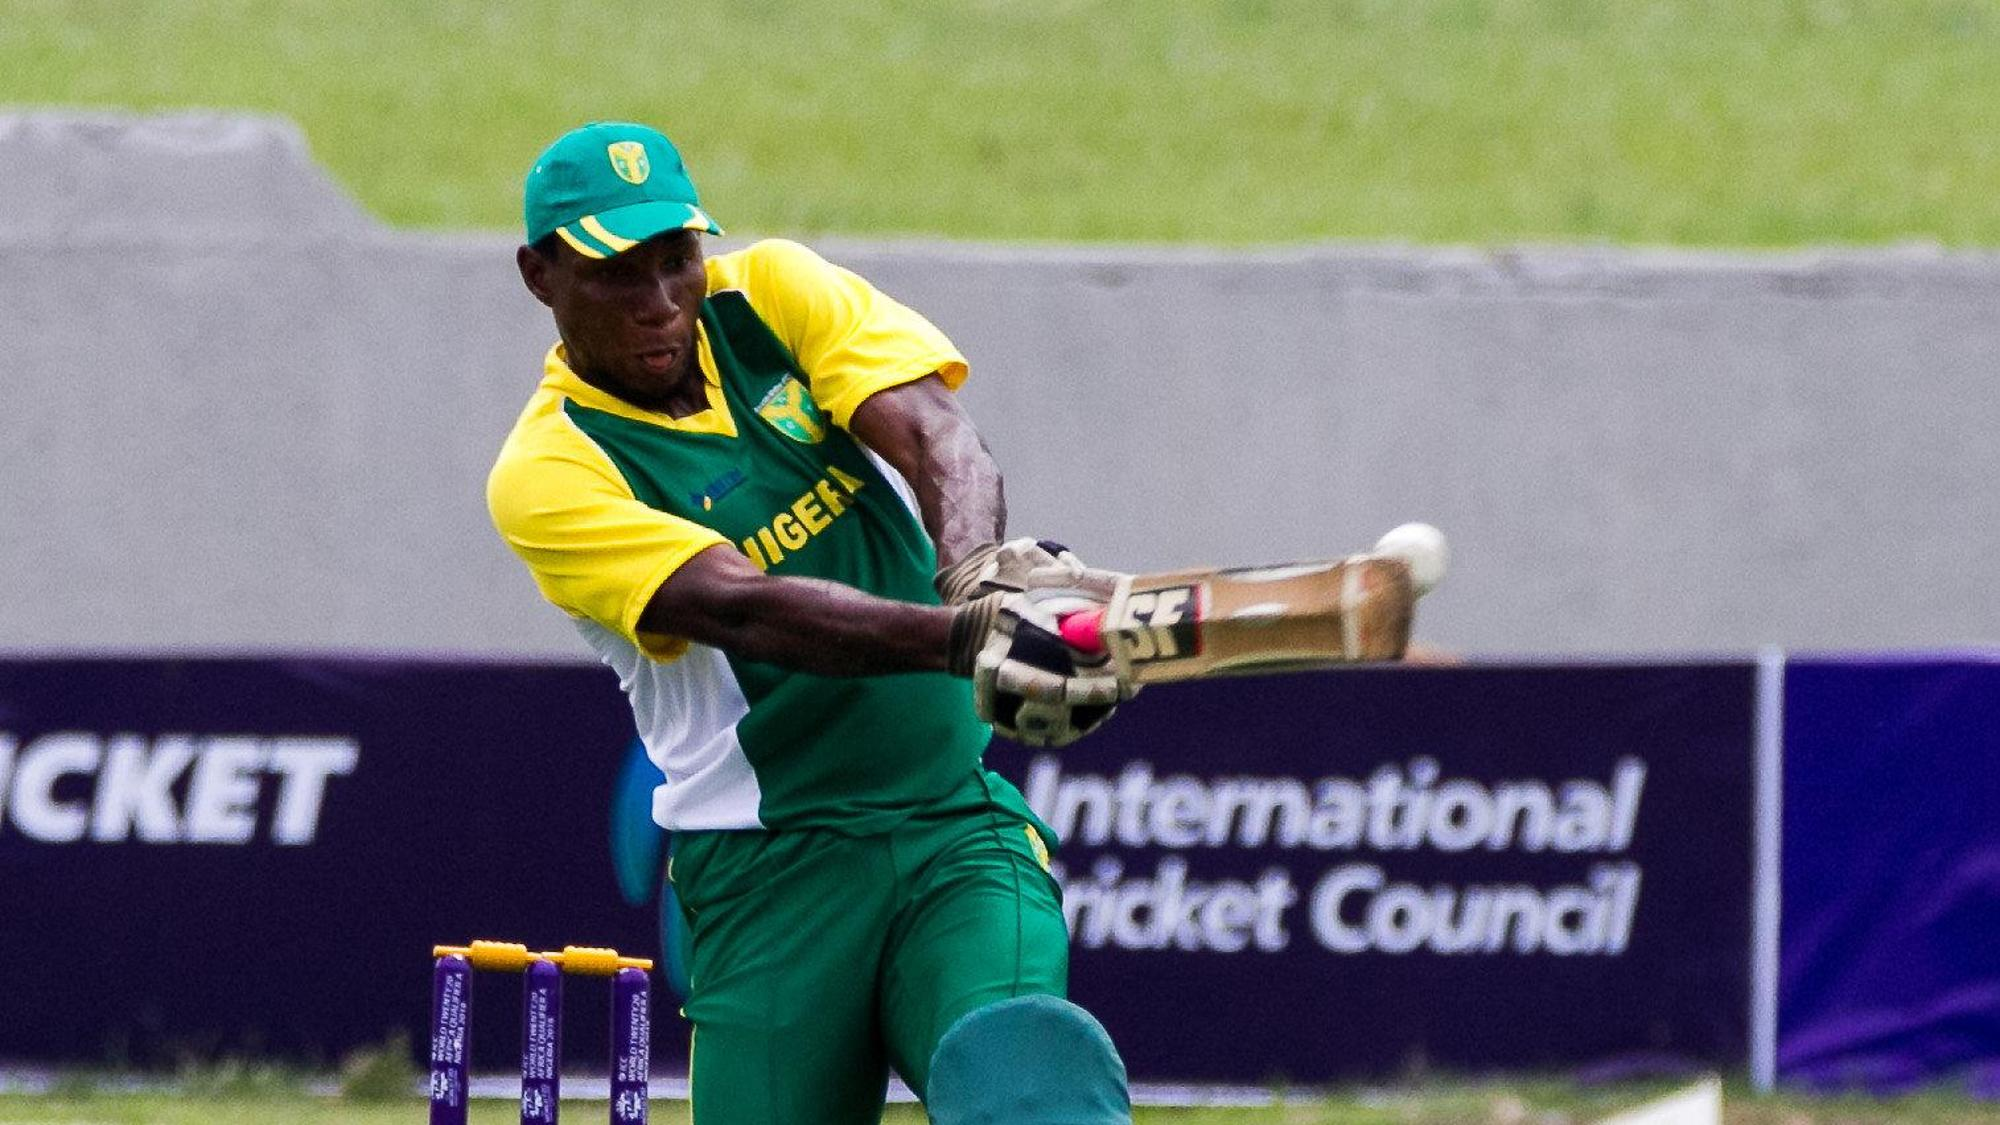 Chimezie Onwuzilike (Nigeria) pulls a short ball